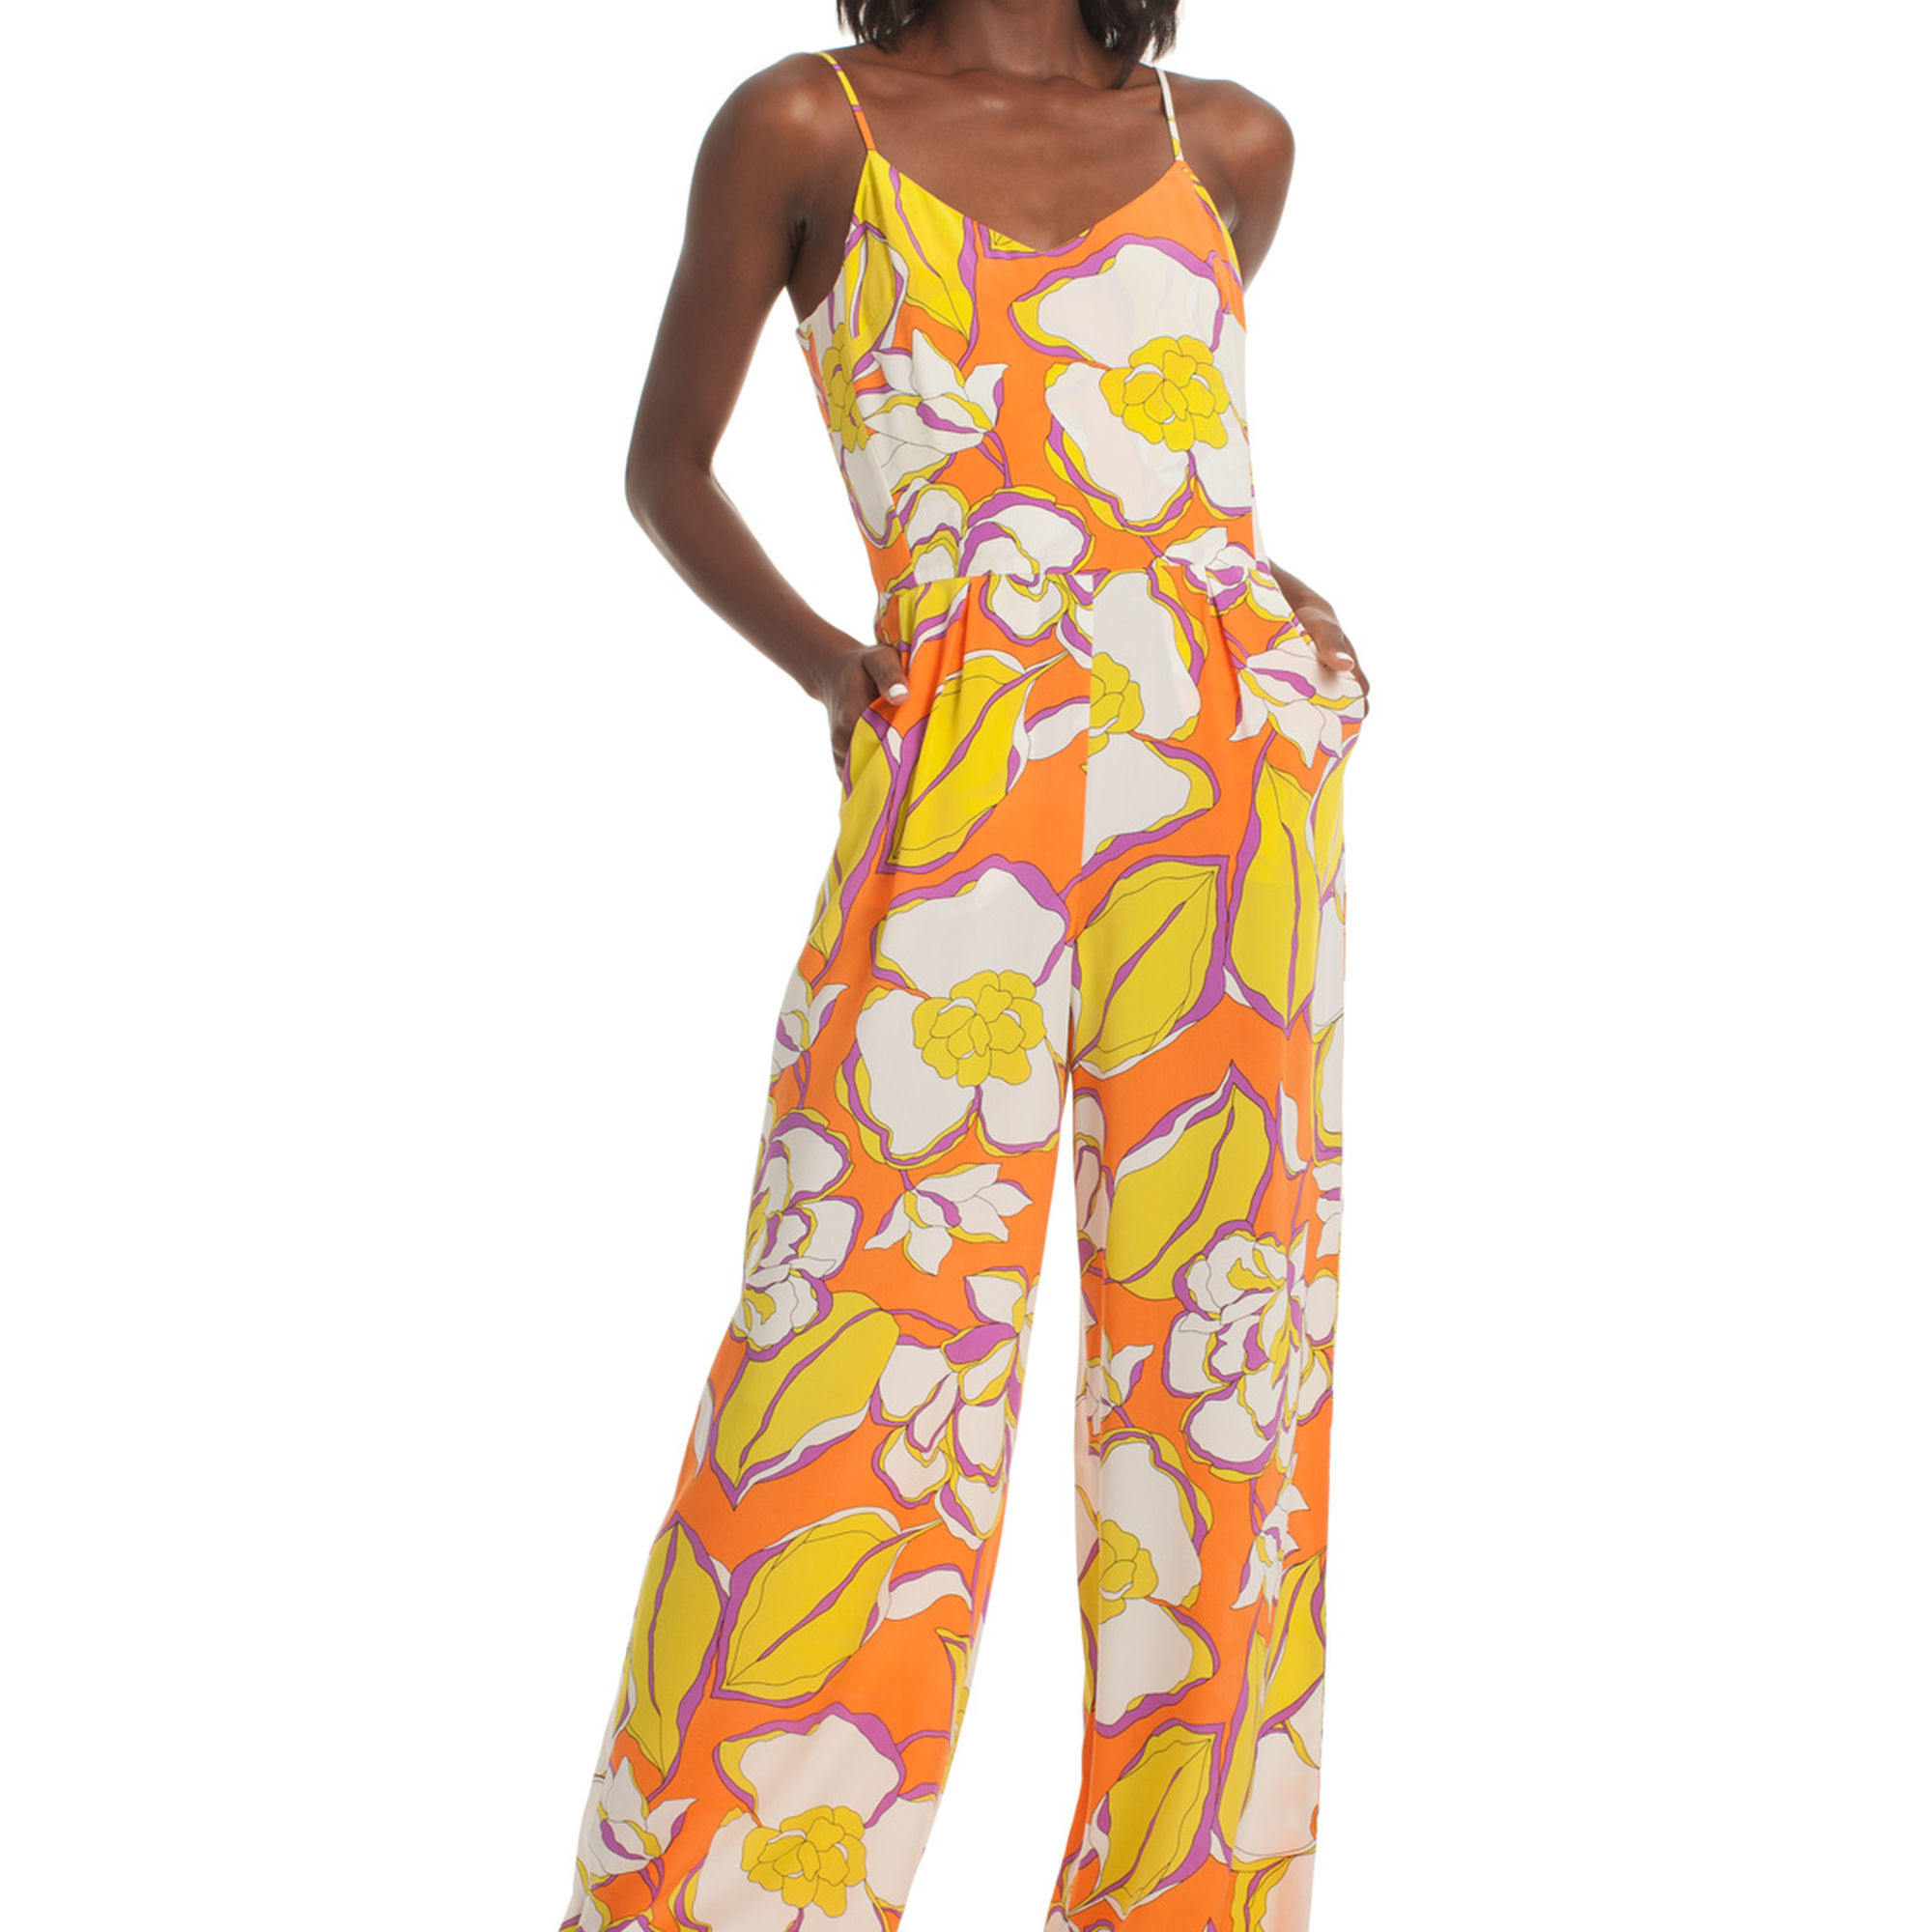 5008401e65bd Trina Turk Zadie Sleeveless Silk Jumpsuit in Orange - Lyst